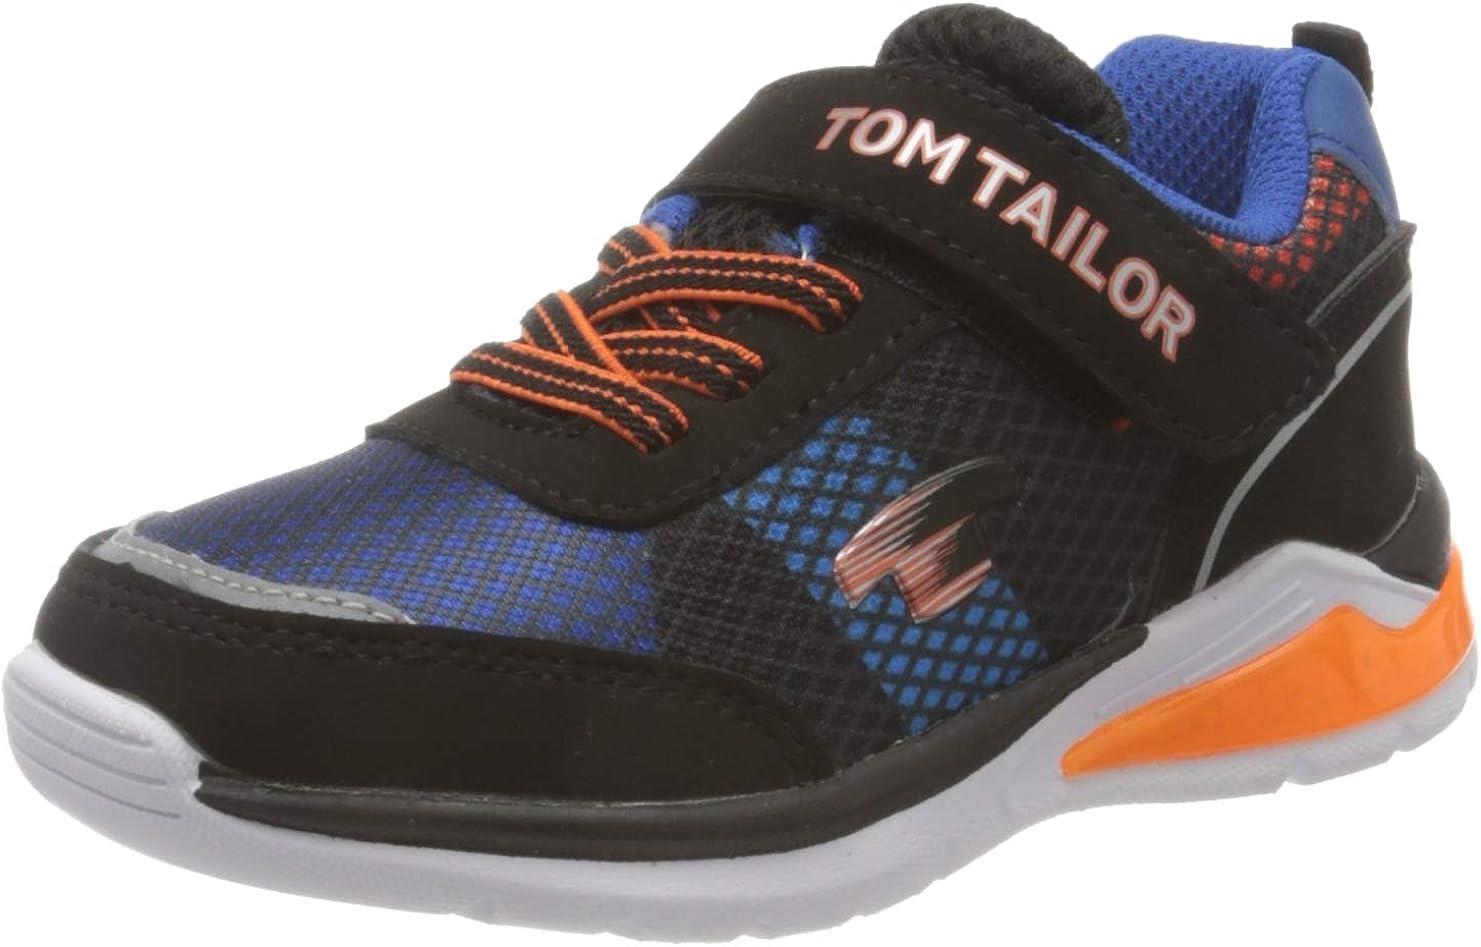 TOM TAILOR Unisex Kinder 8070101 Cross-Trainer